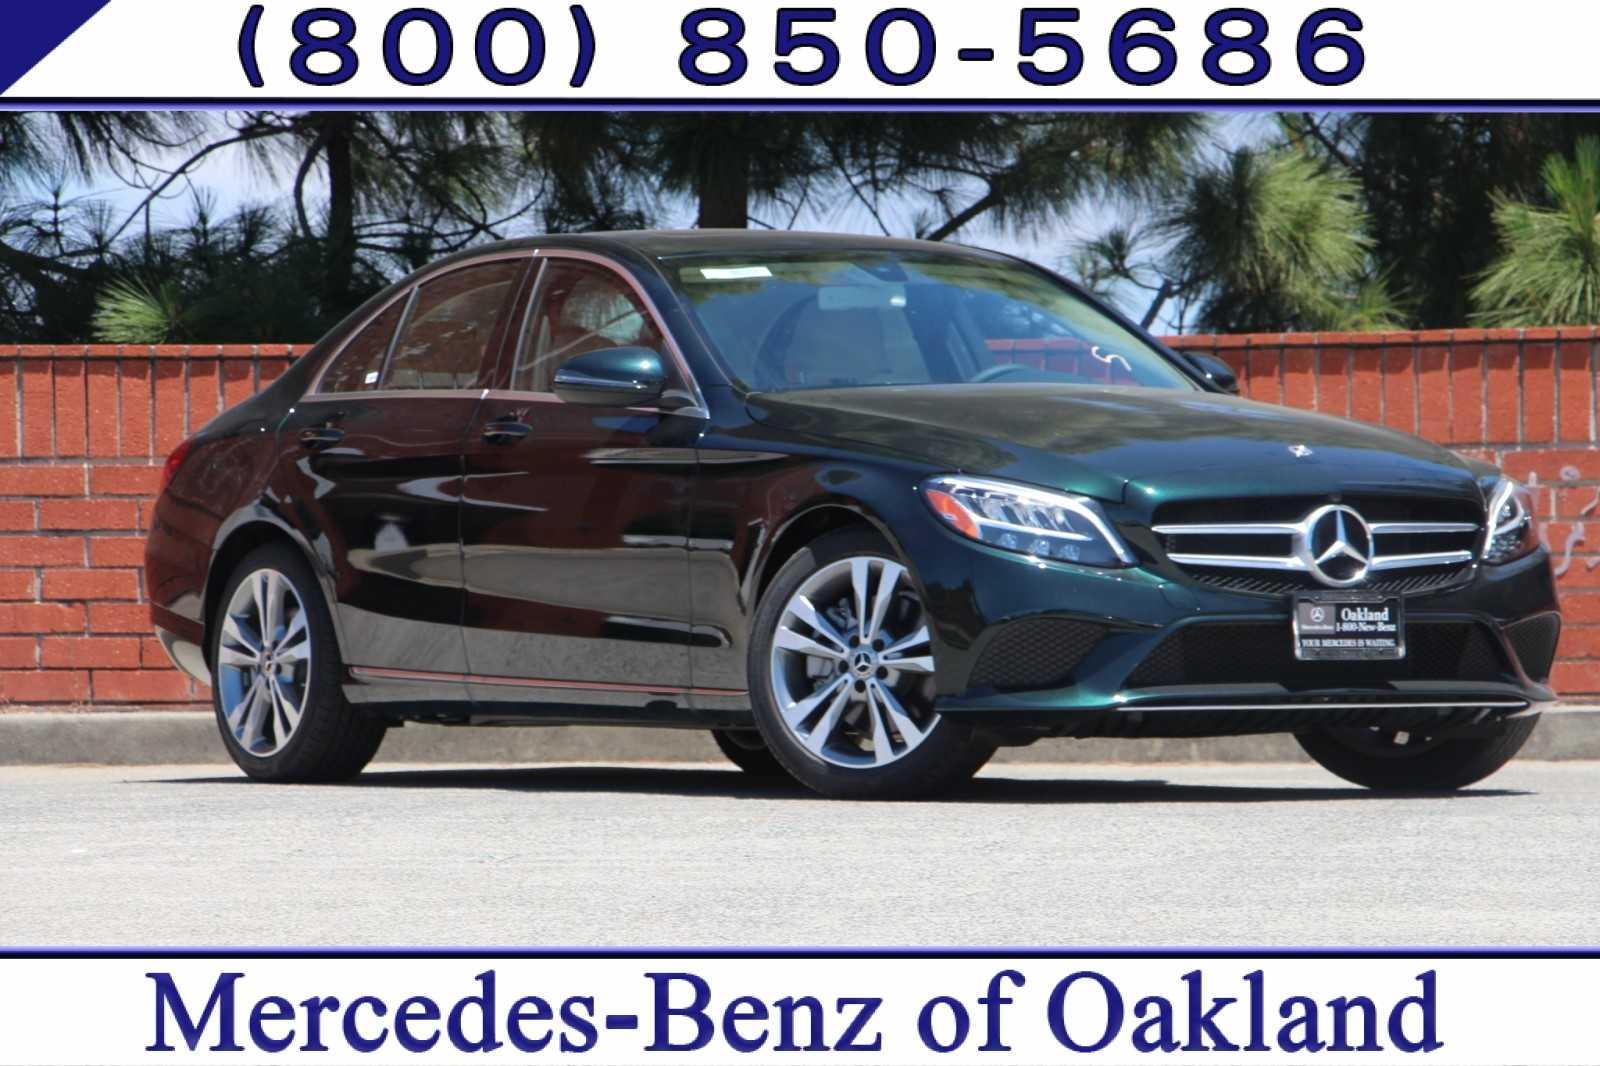 New 2019 Mercedes-Benz C-Class C 300 Sedan for sale in Oakland, CA